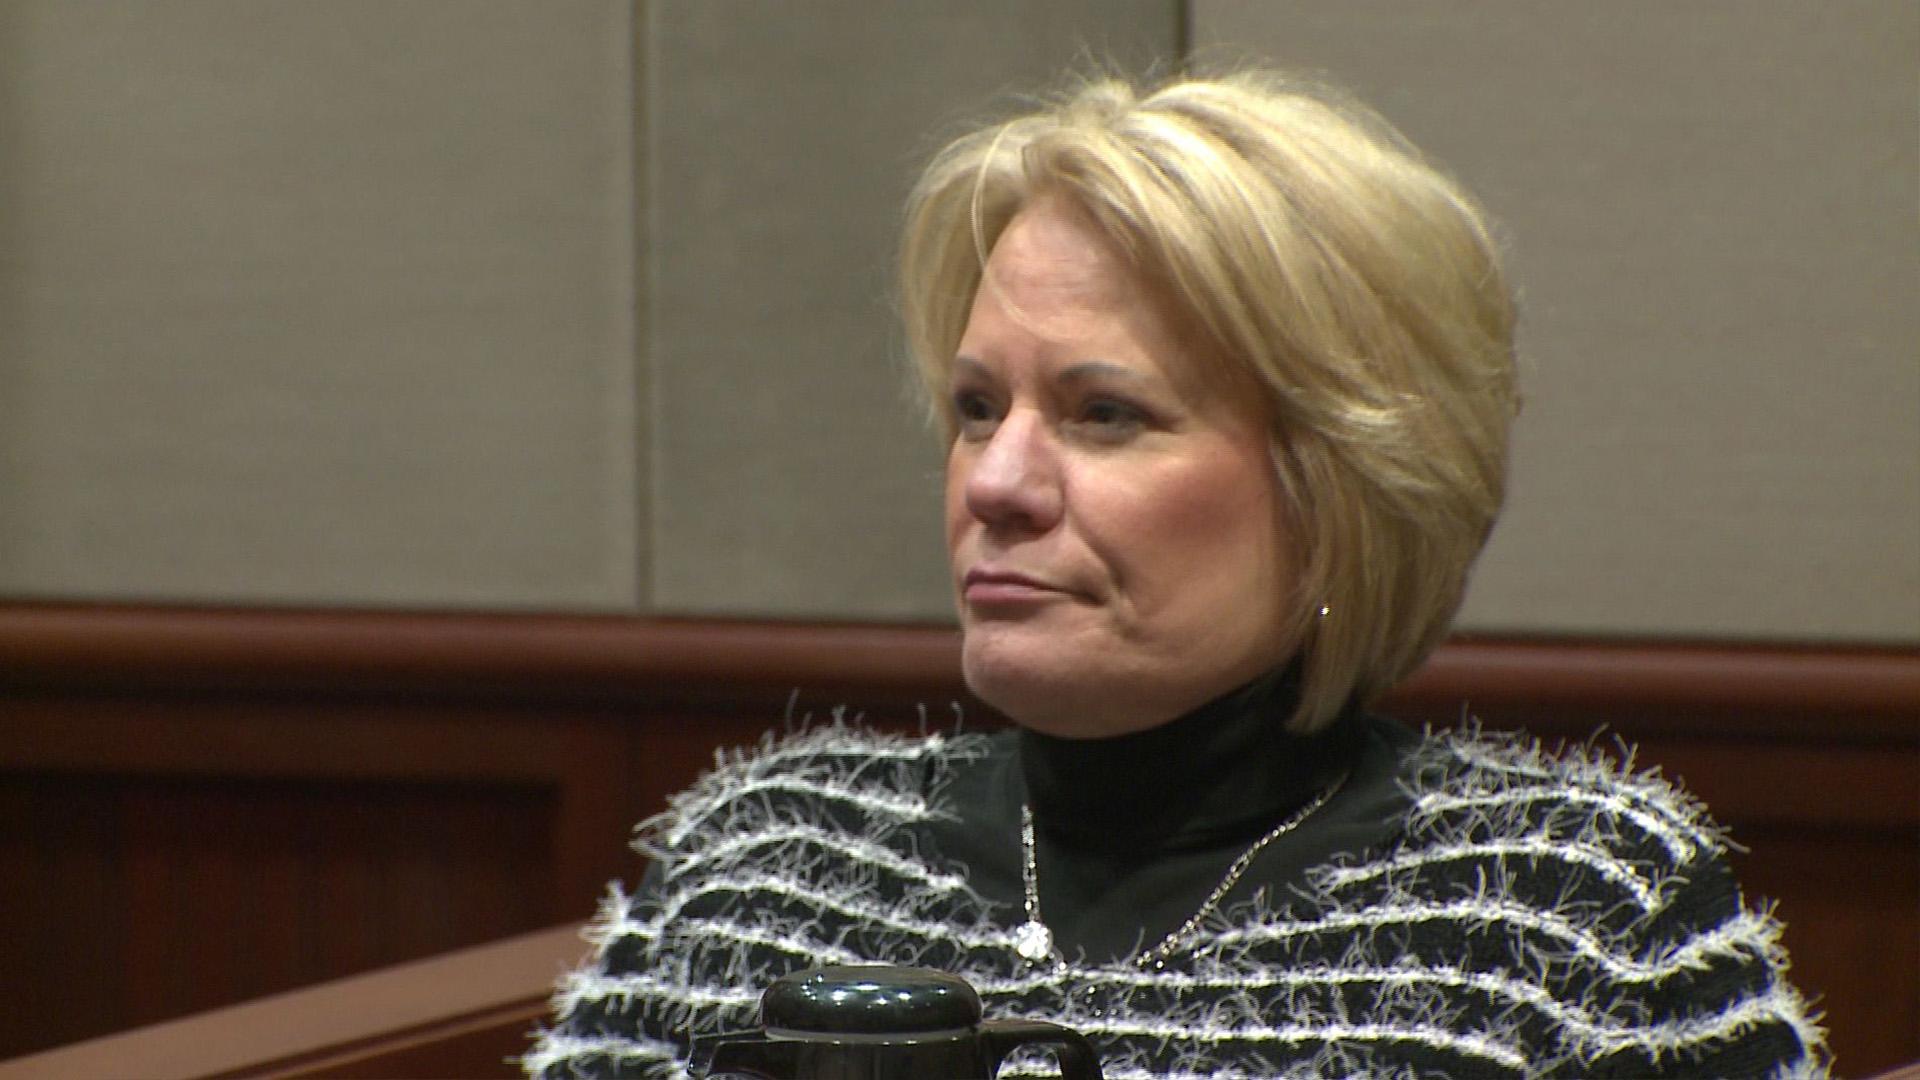 Pamela Hupp during her trial.